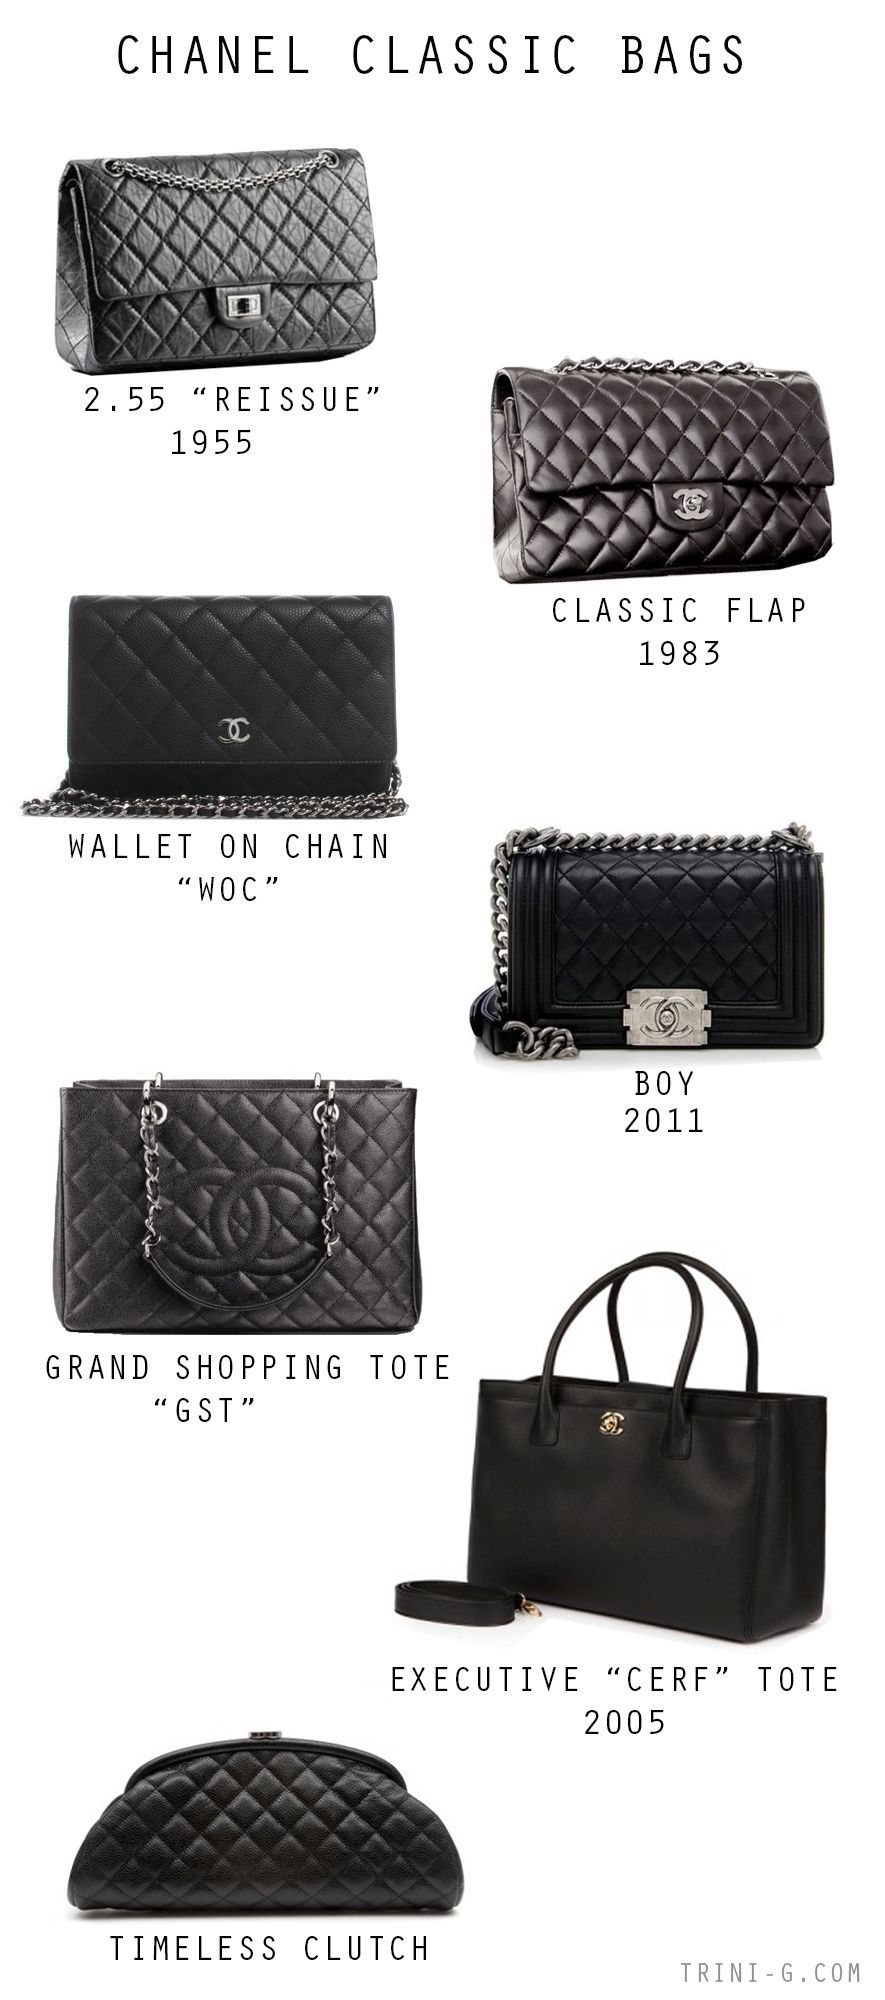 chanel classic bags handbags. Black Bedroom Furniture Sets. Home Design Ideas